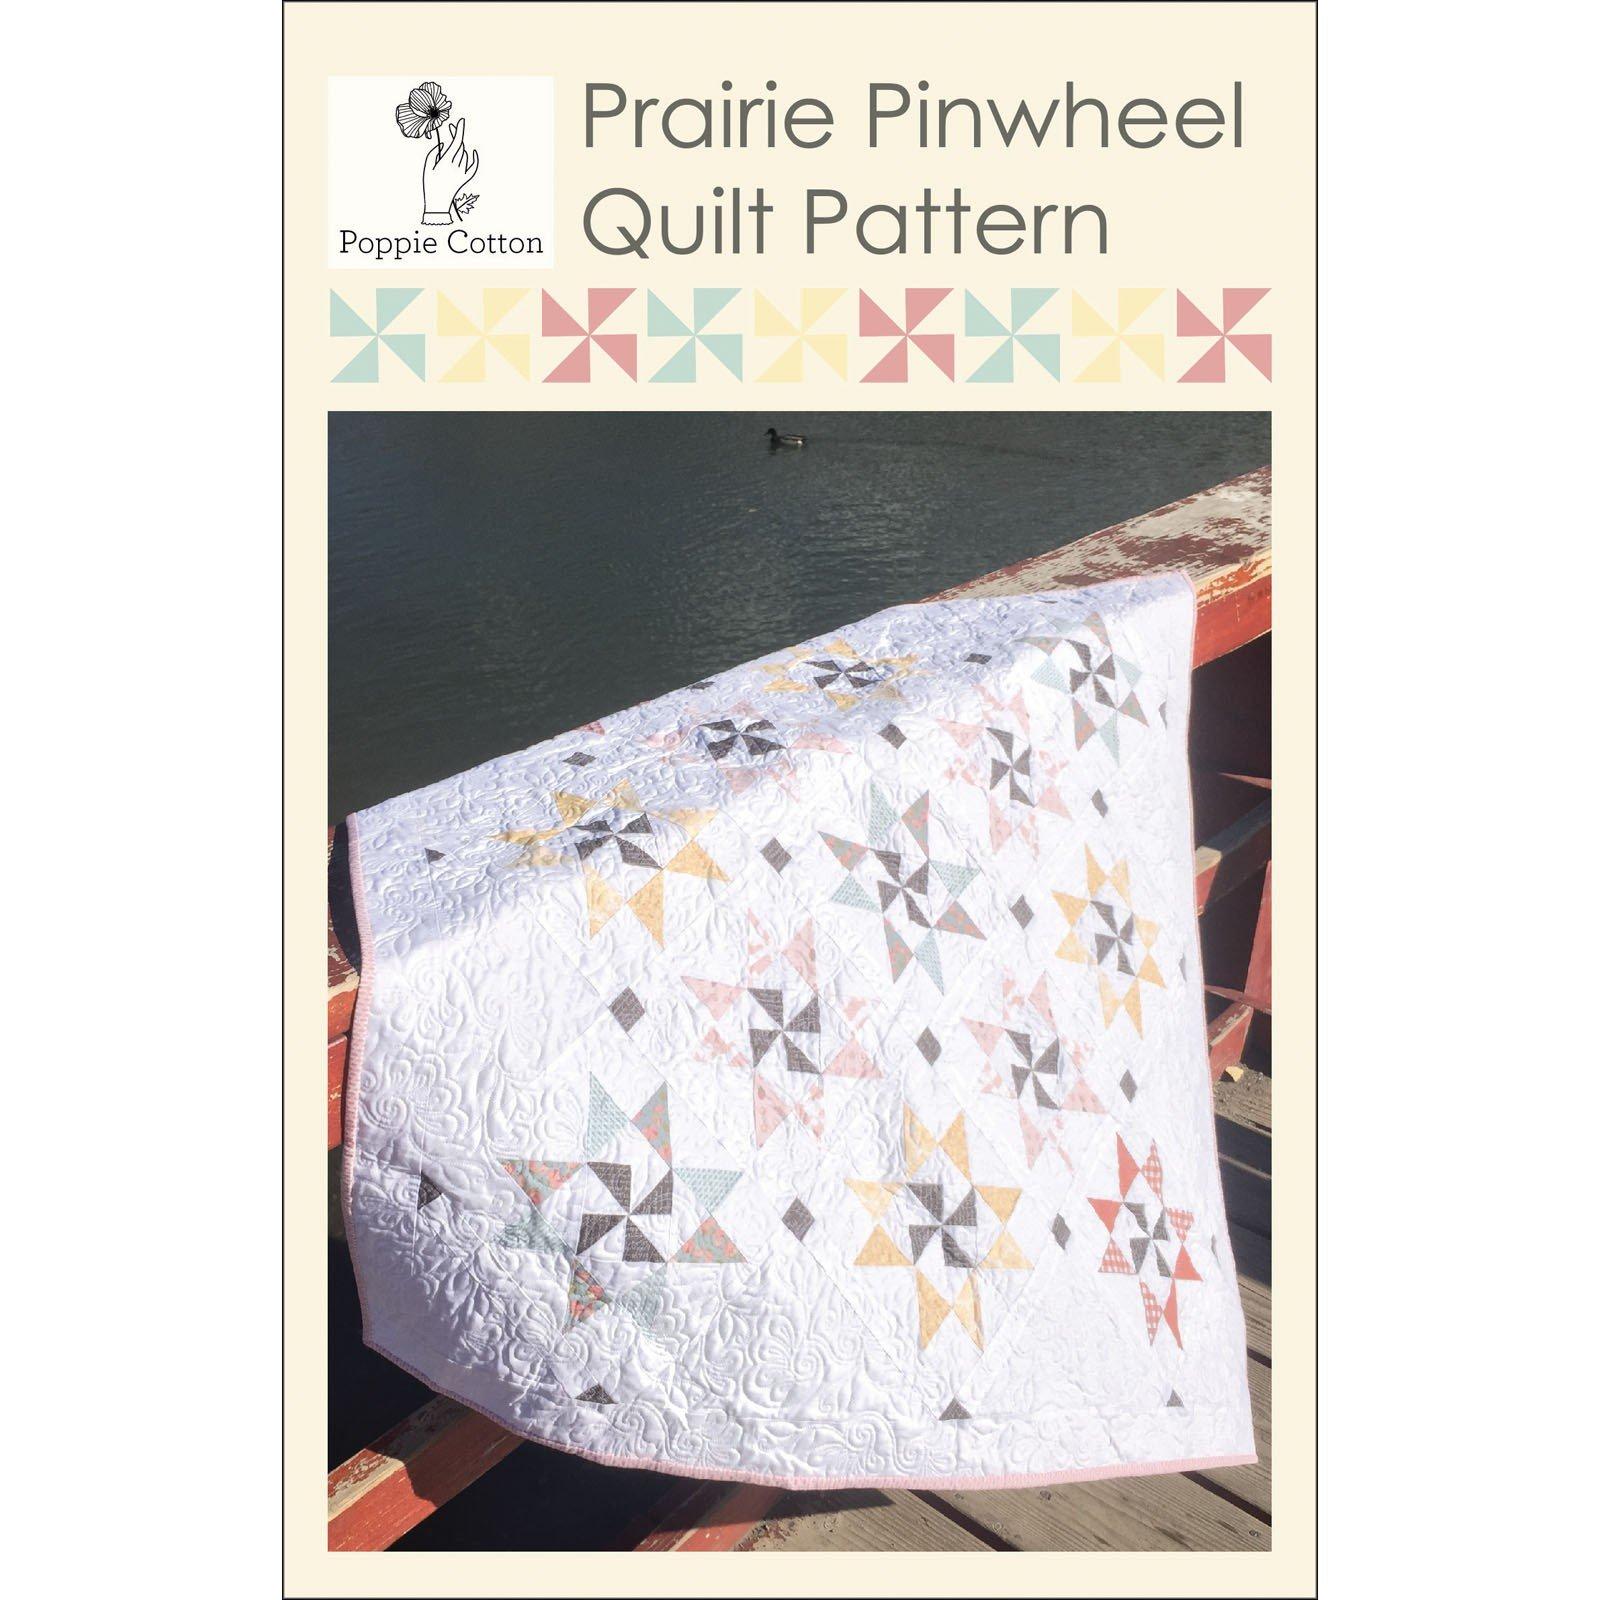 Prairie Pinwheel Quilt - PCN1903